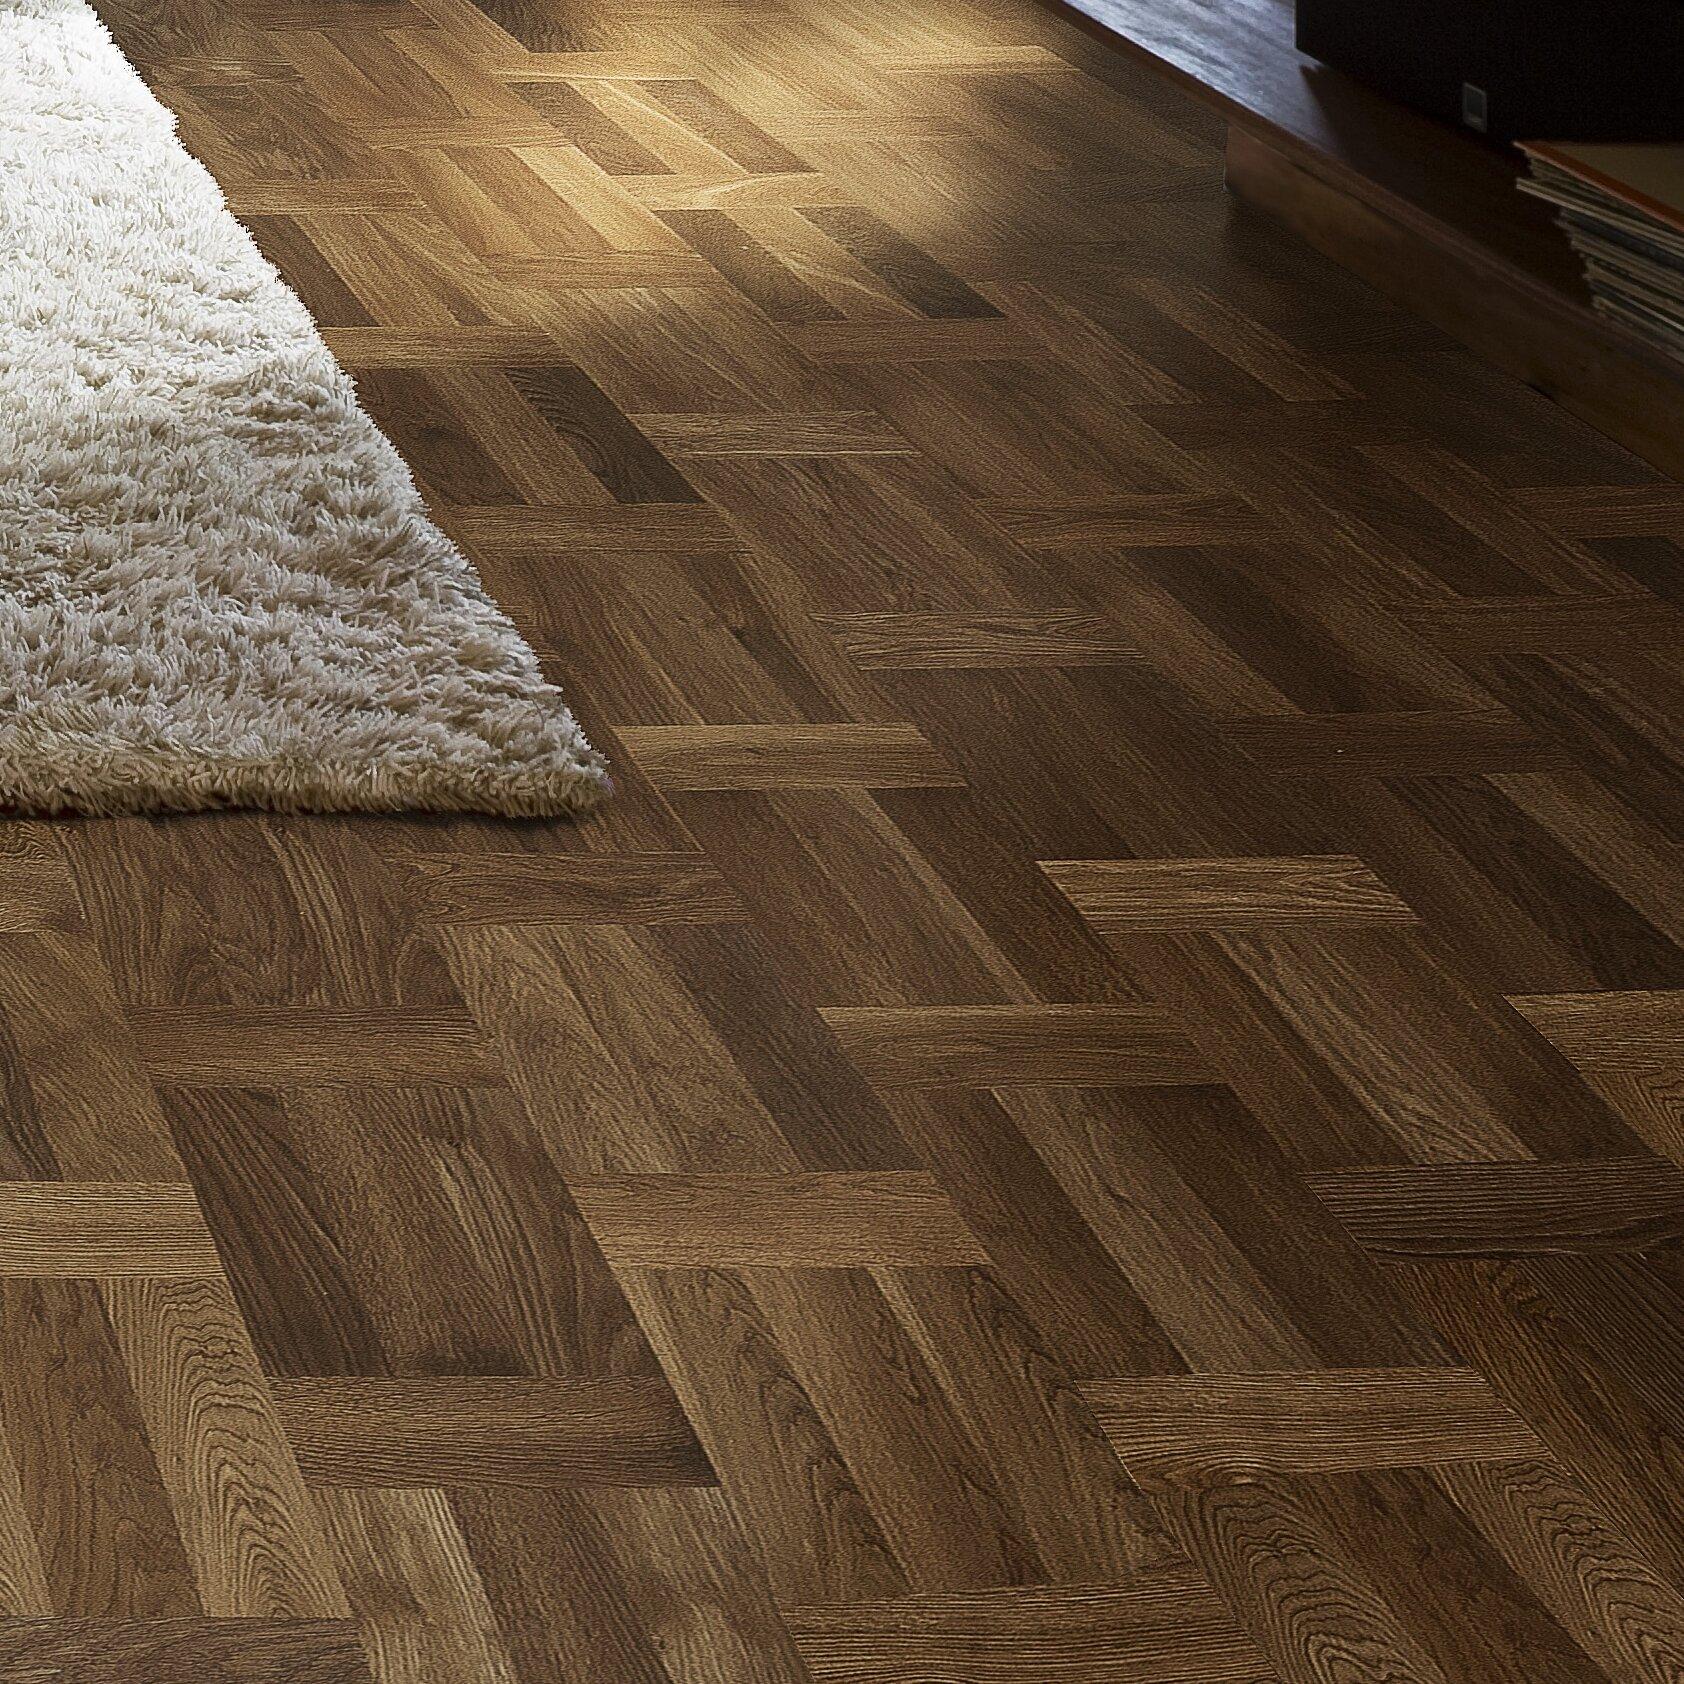 "European Renaissance Oak 5/5"" Thick x 5-5/5"" Wide x 5"" Length Engineered  Parquet Hardwood Flooring"